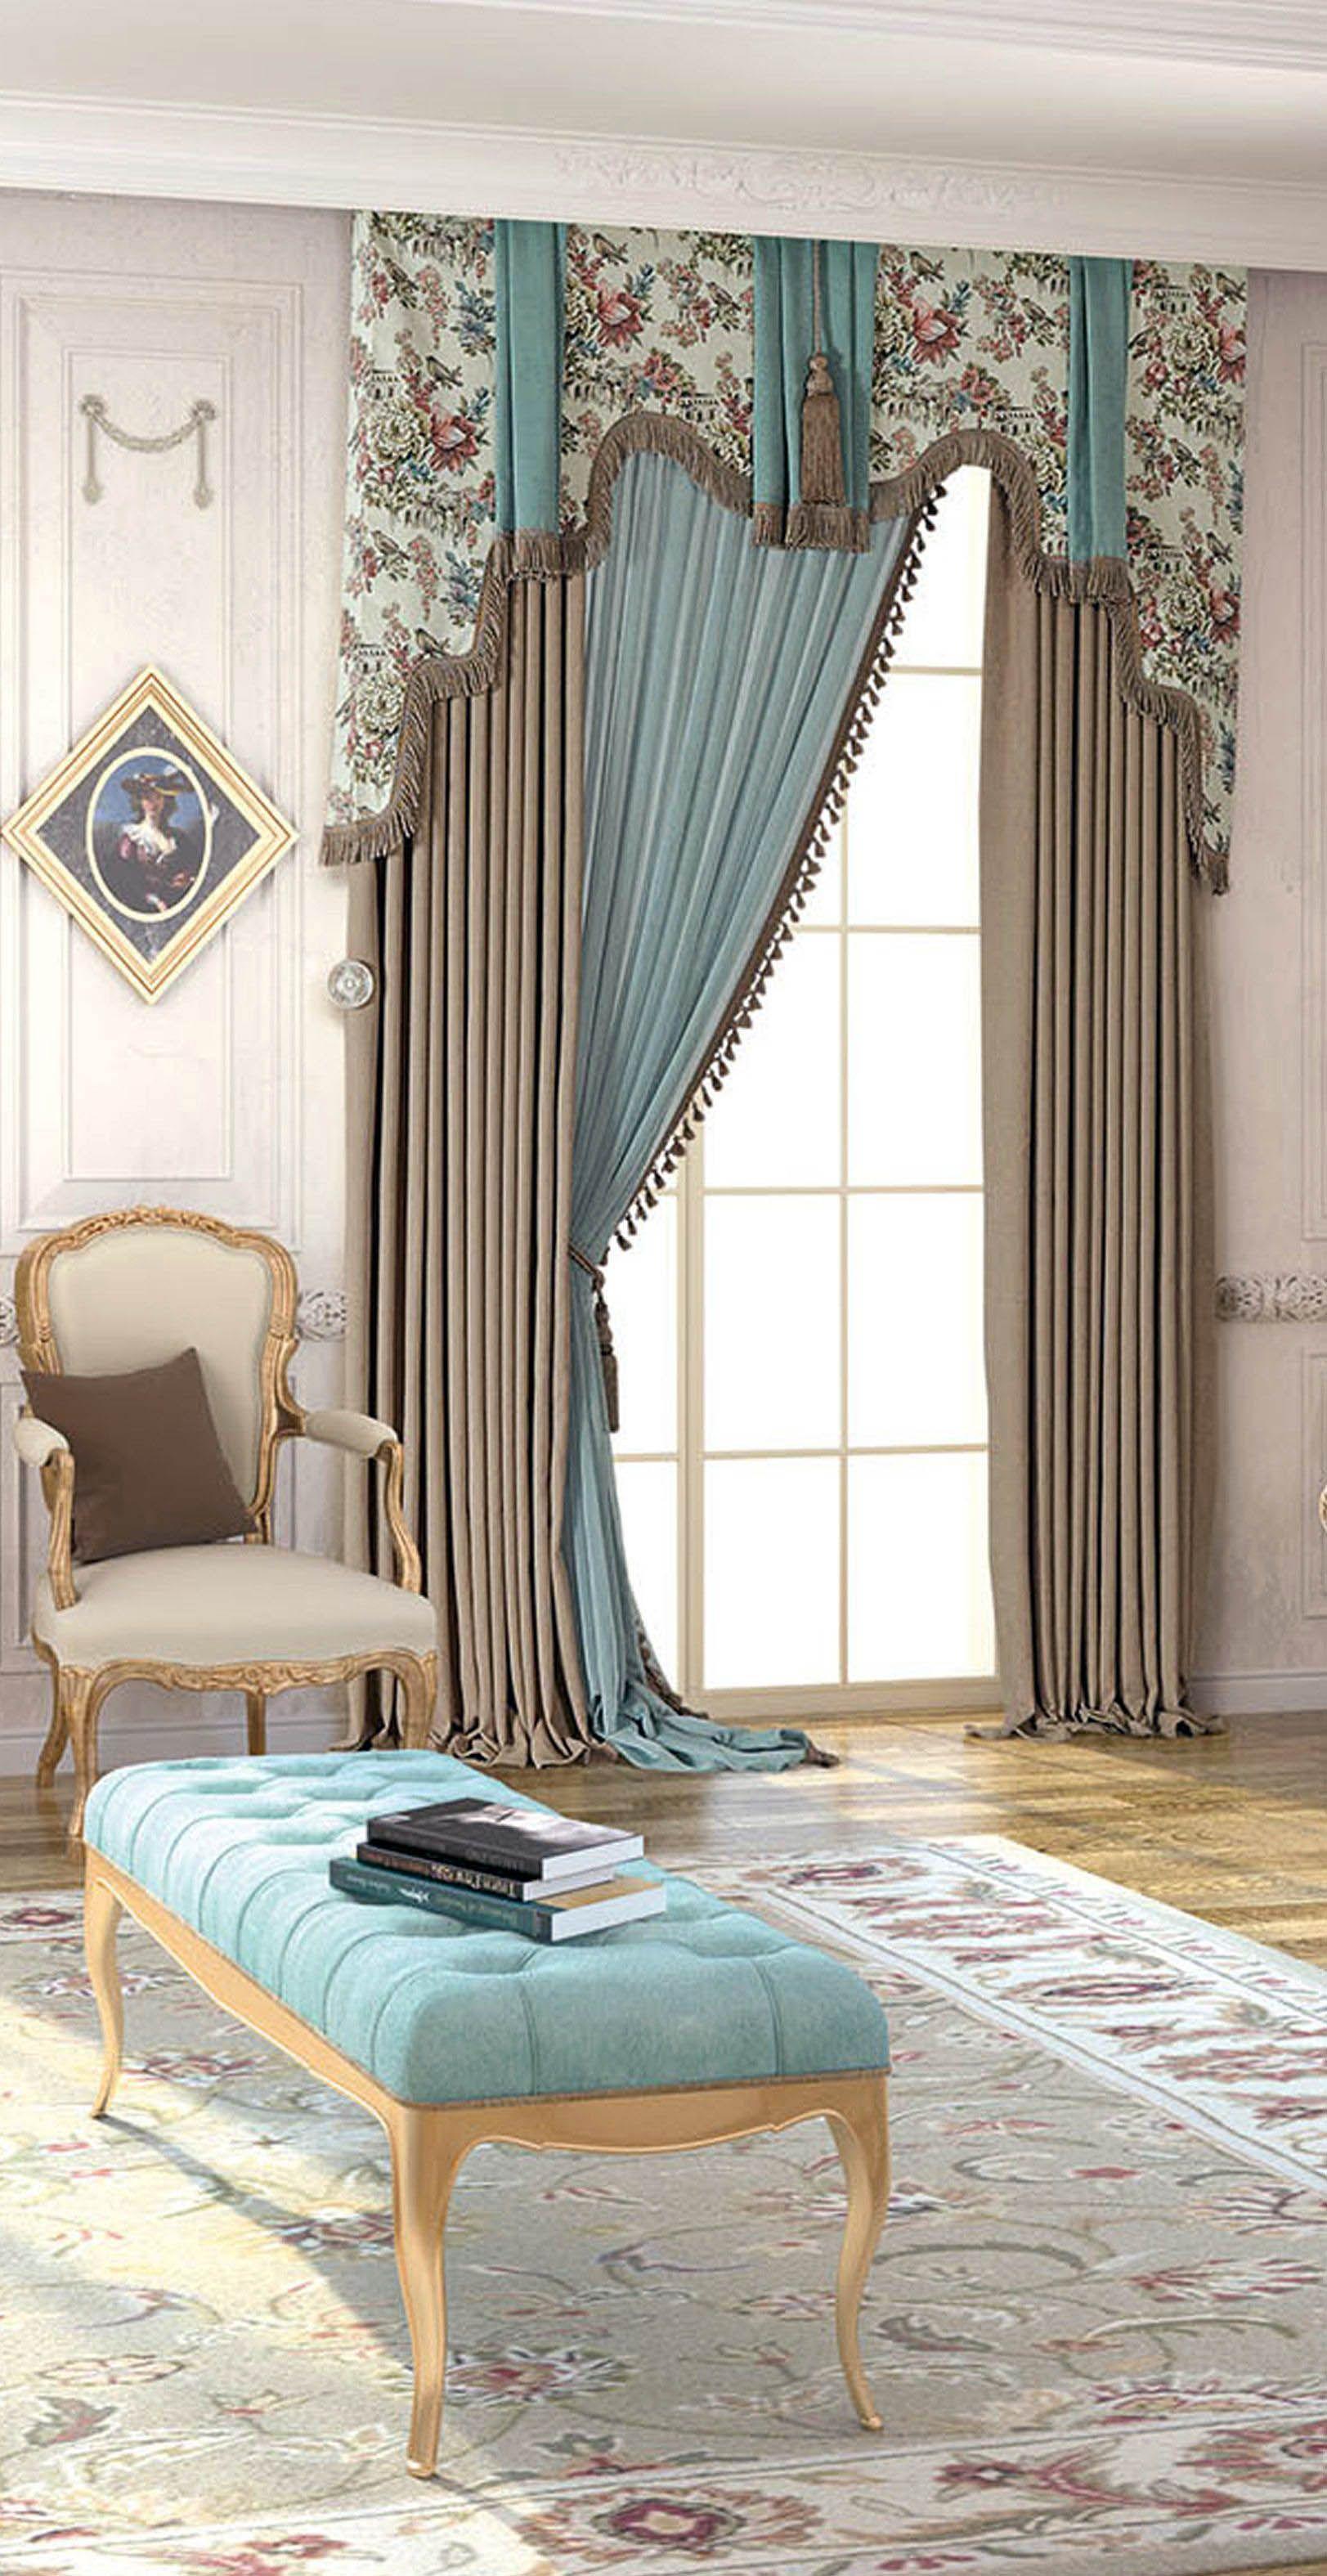 14 Stylish Bedroom Curtain Design Ideas Home Curtains Luxury